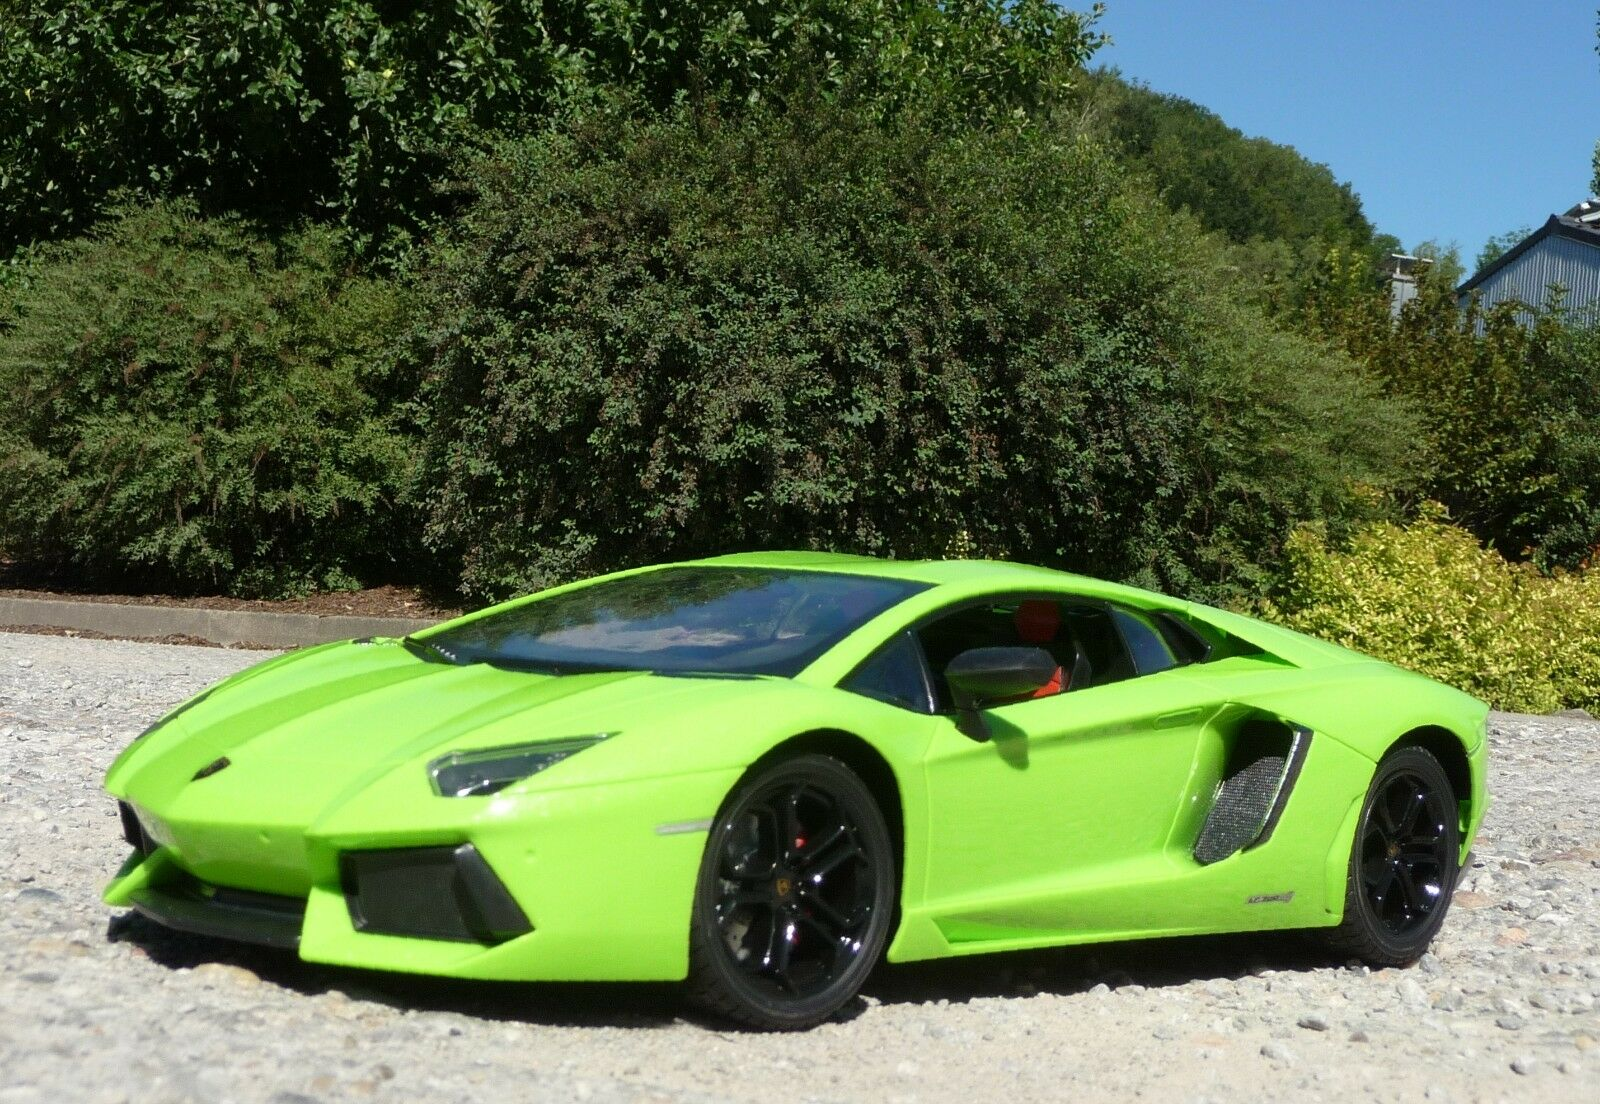 RC Lamborghini AVENTADOR mit AKKU + LICHT 1 10 48cm Ferngesteuert 2,4-GHz  50011